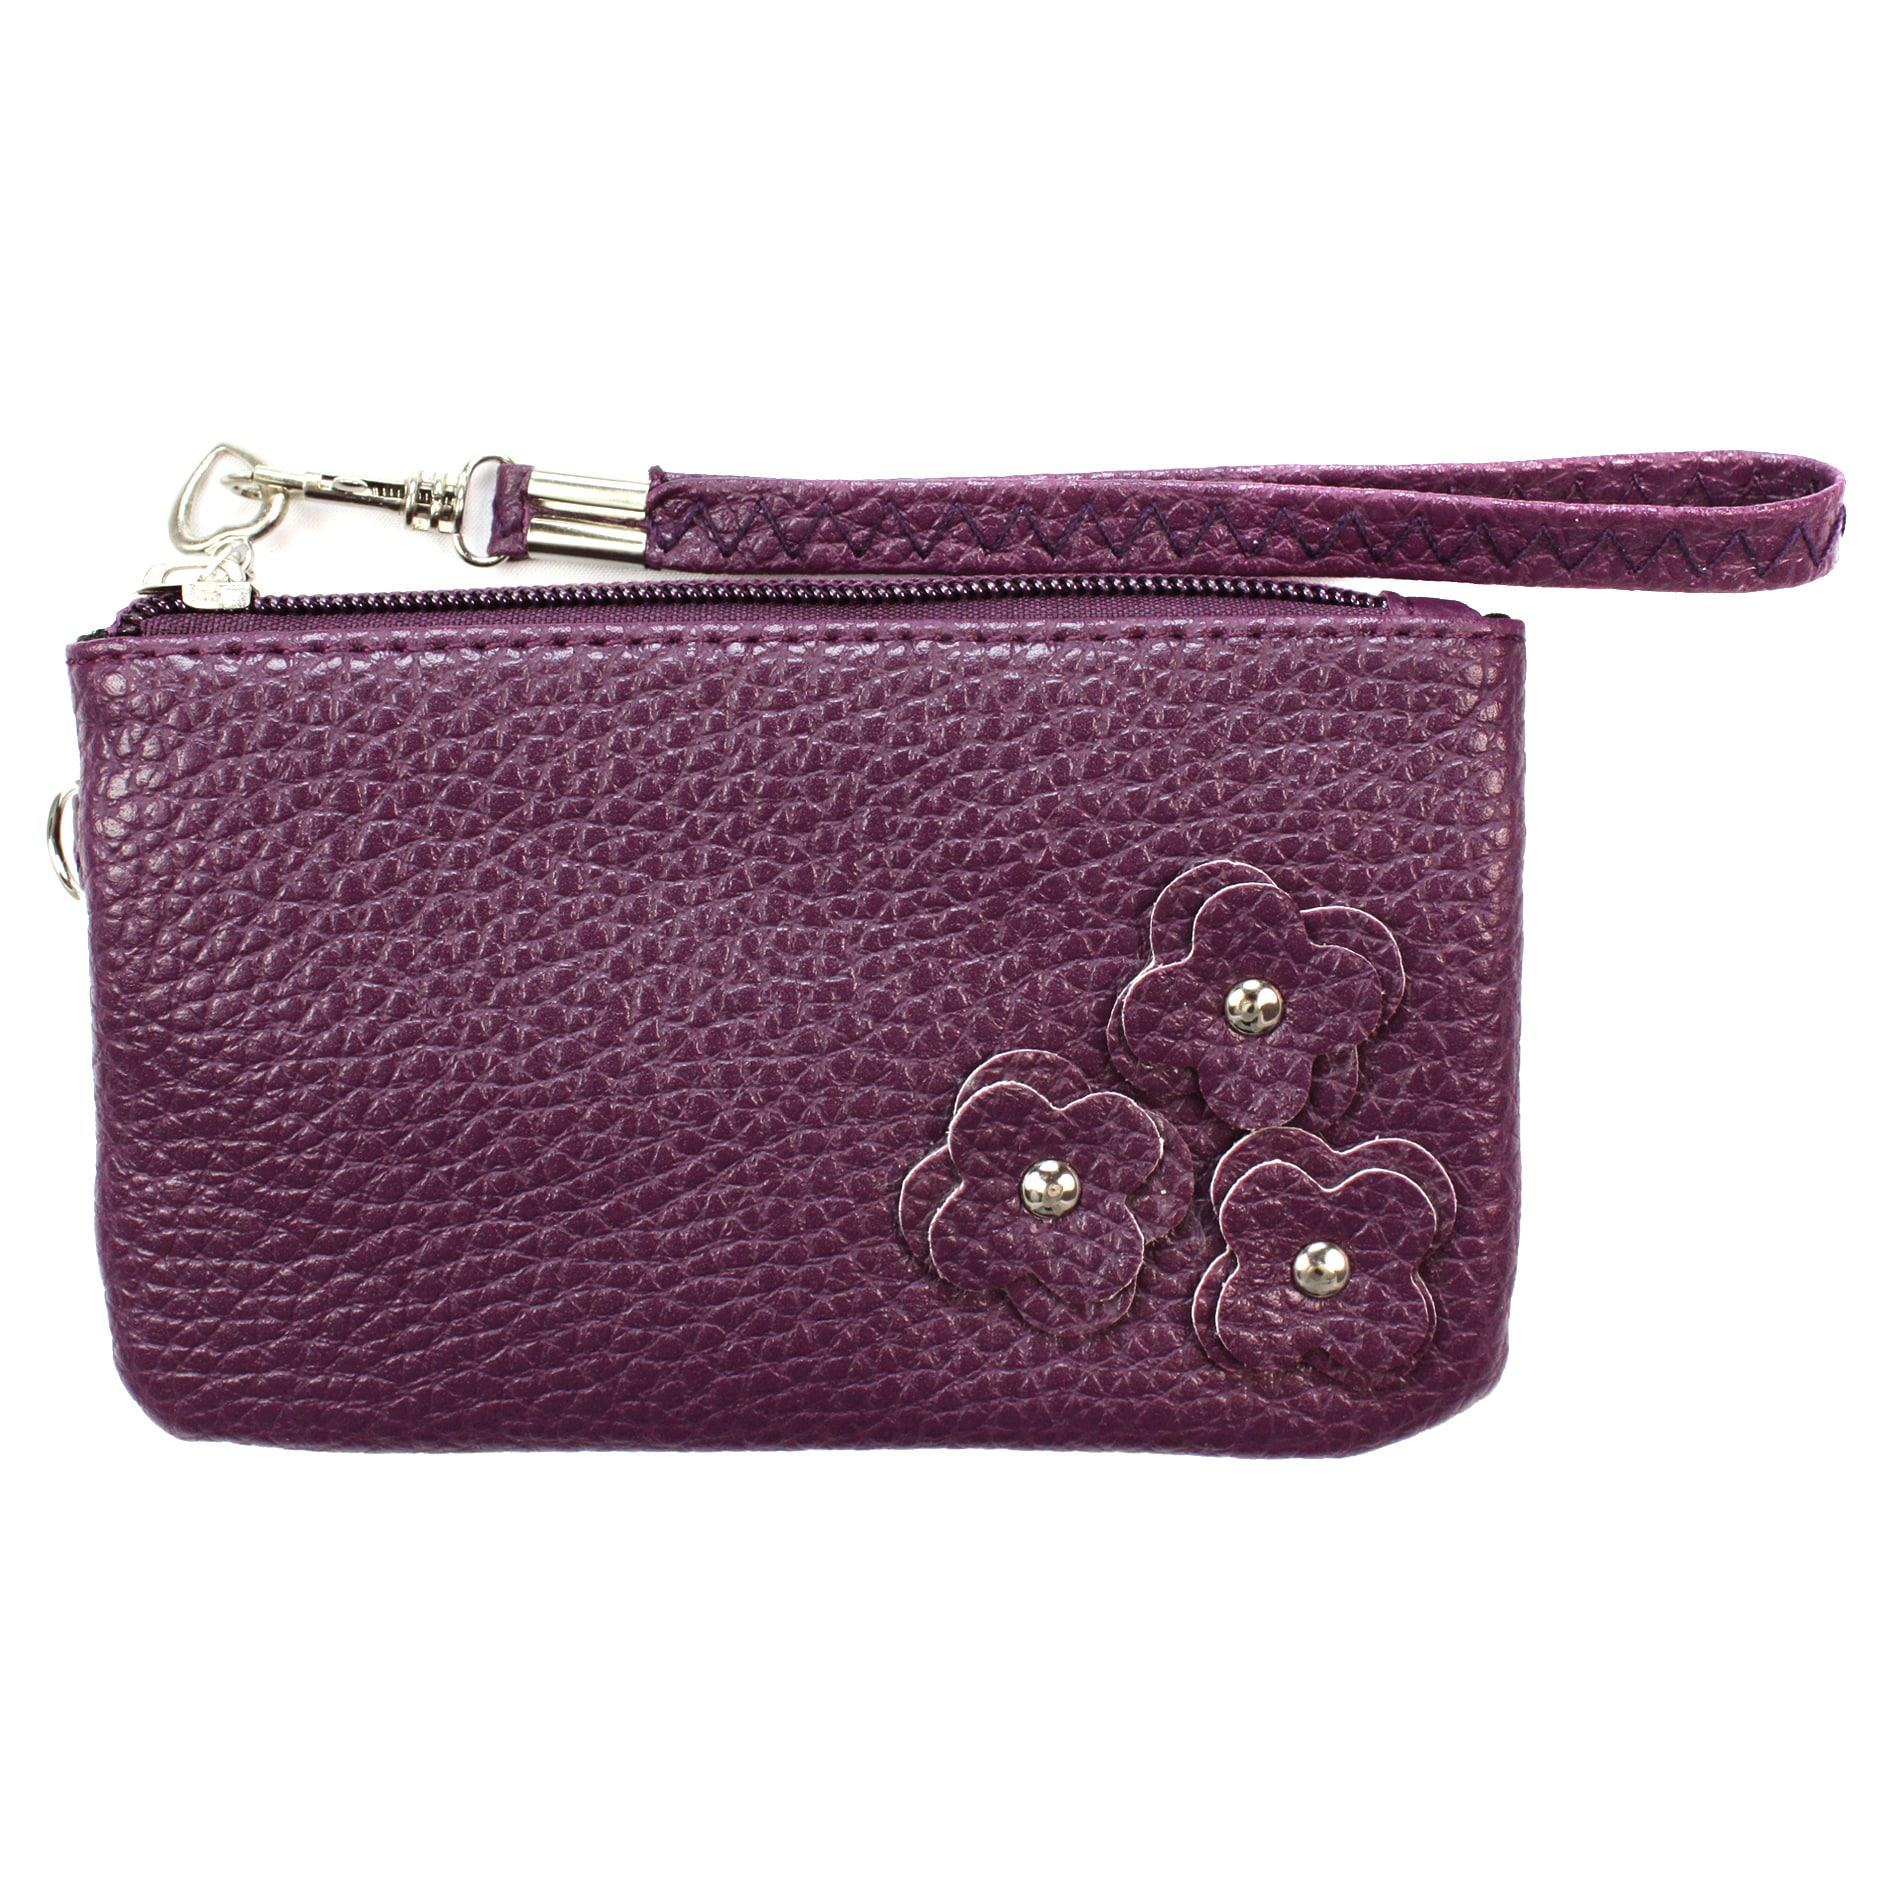 Fashion PU Multi-purpose Wallet / Coin Purse Purple Floral Design